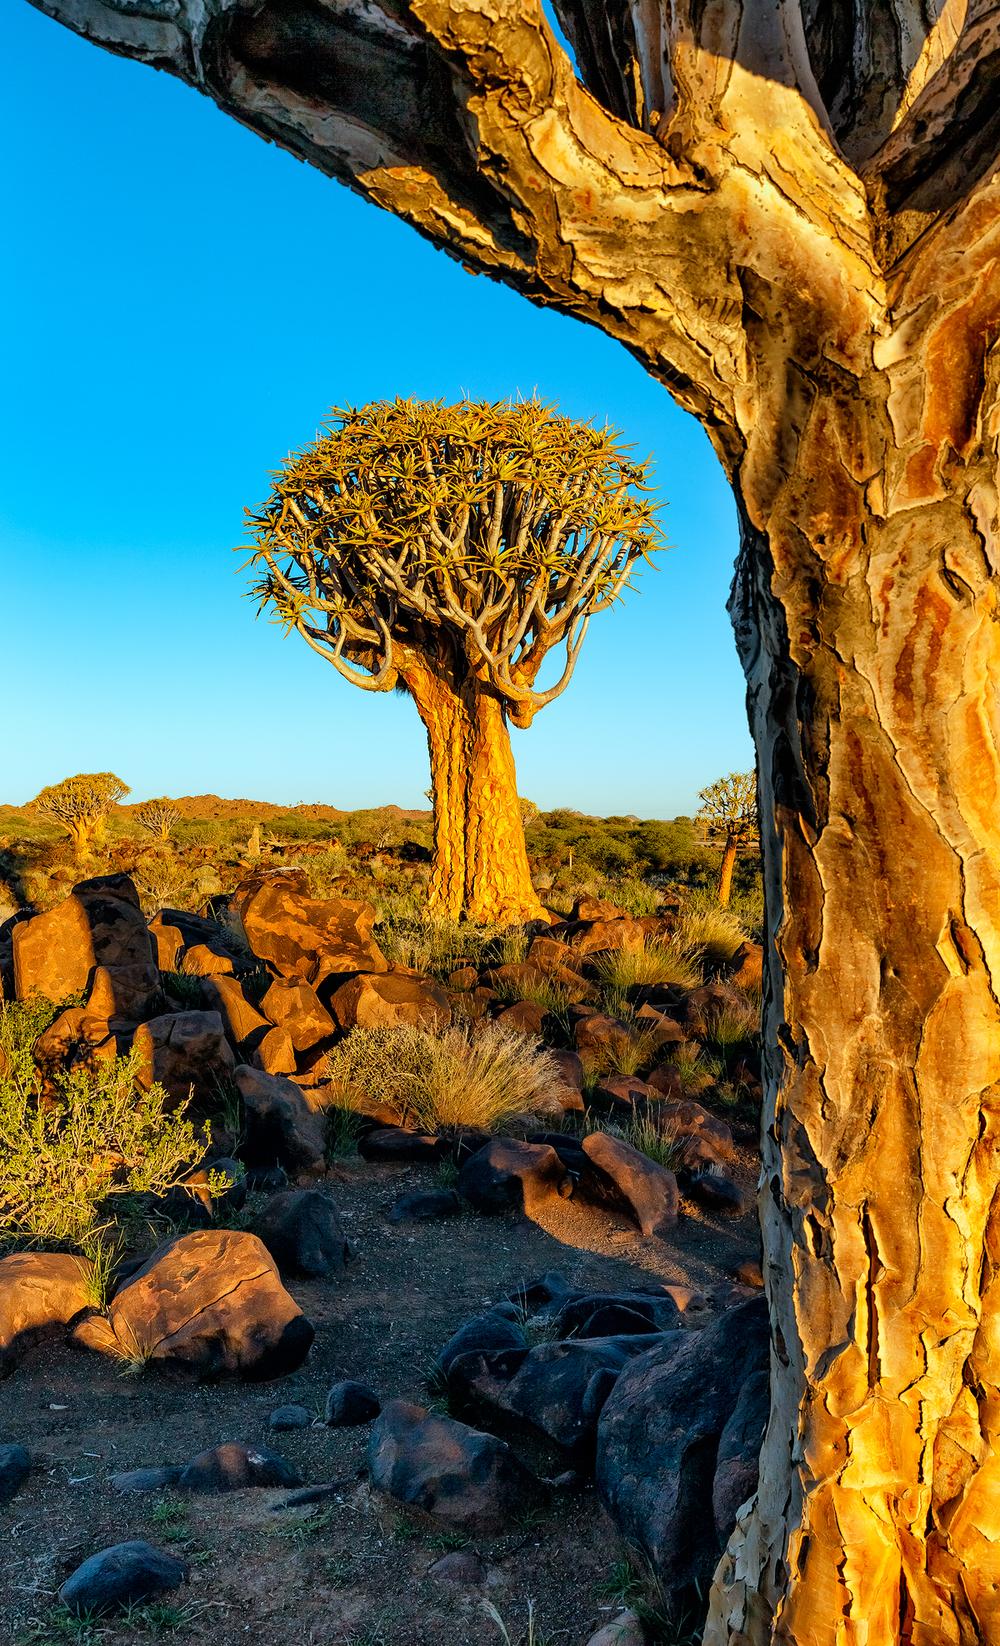 20140330_namibia_keetmanshoop_0104_Web_SS_1200.jpg